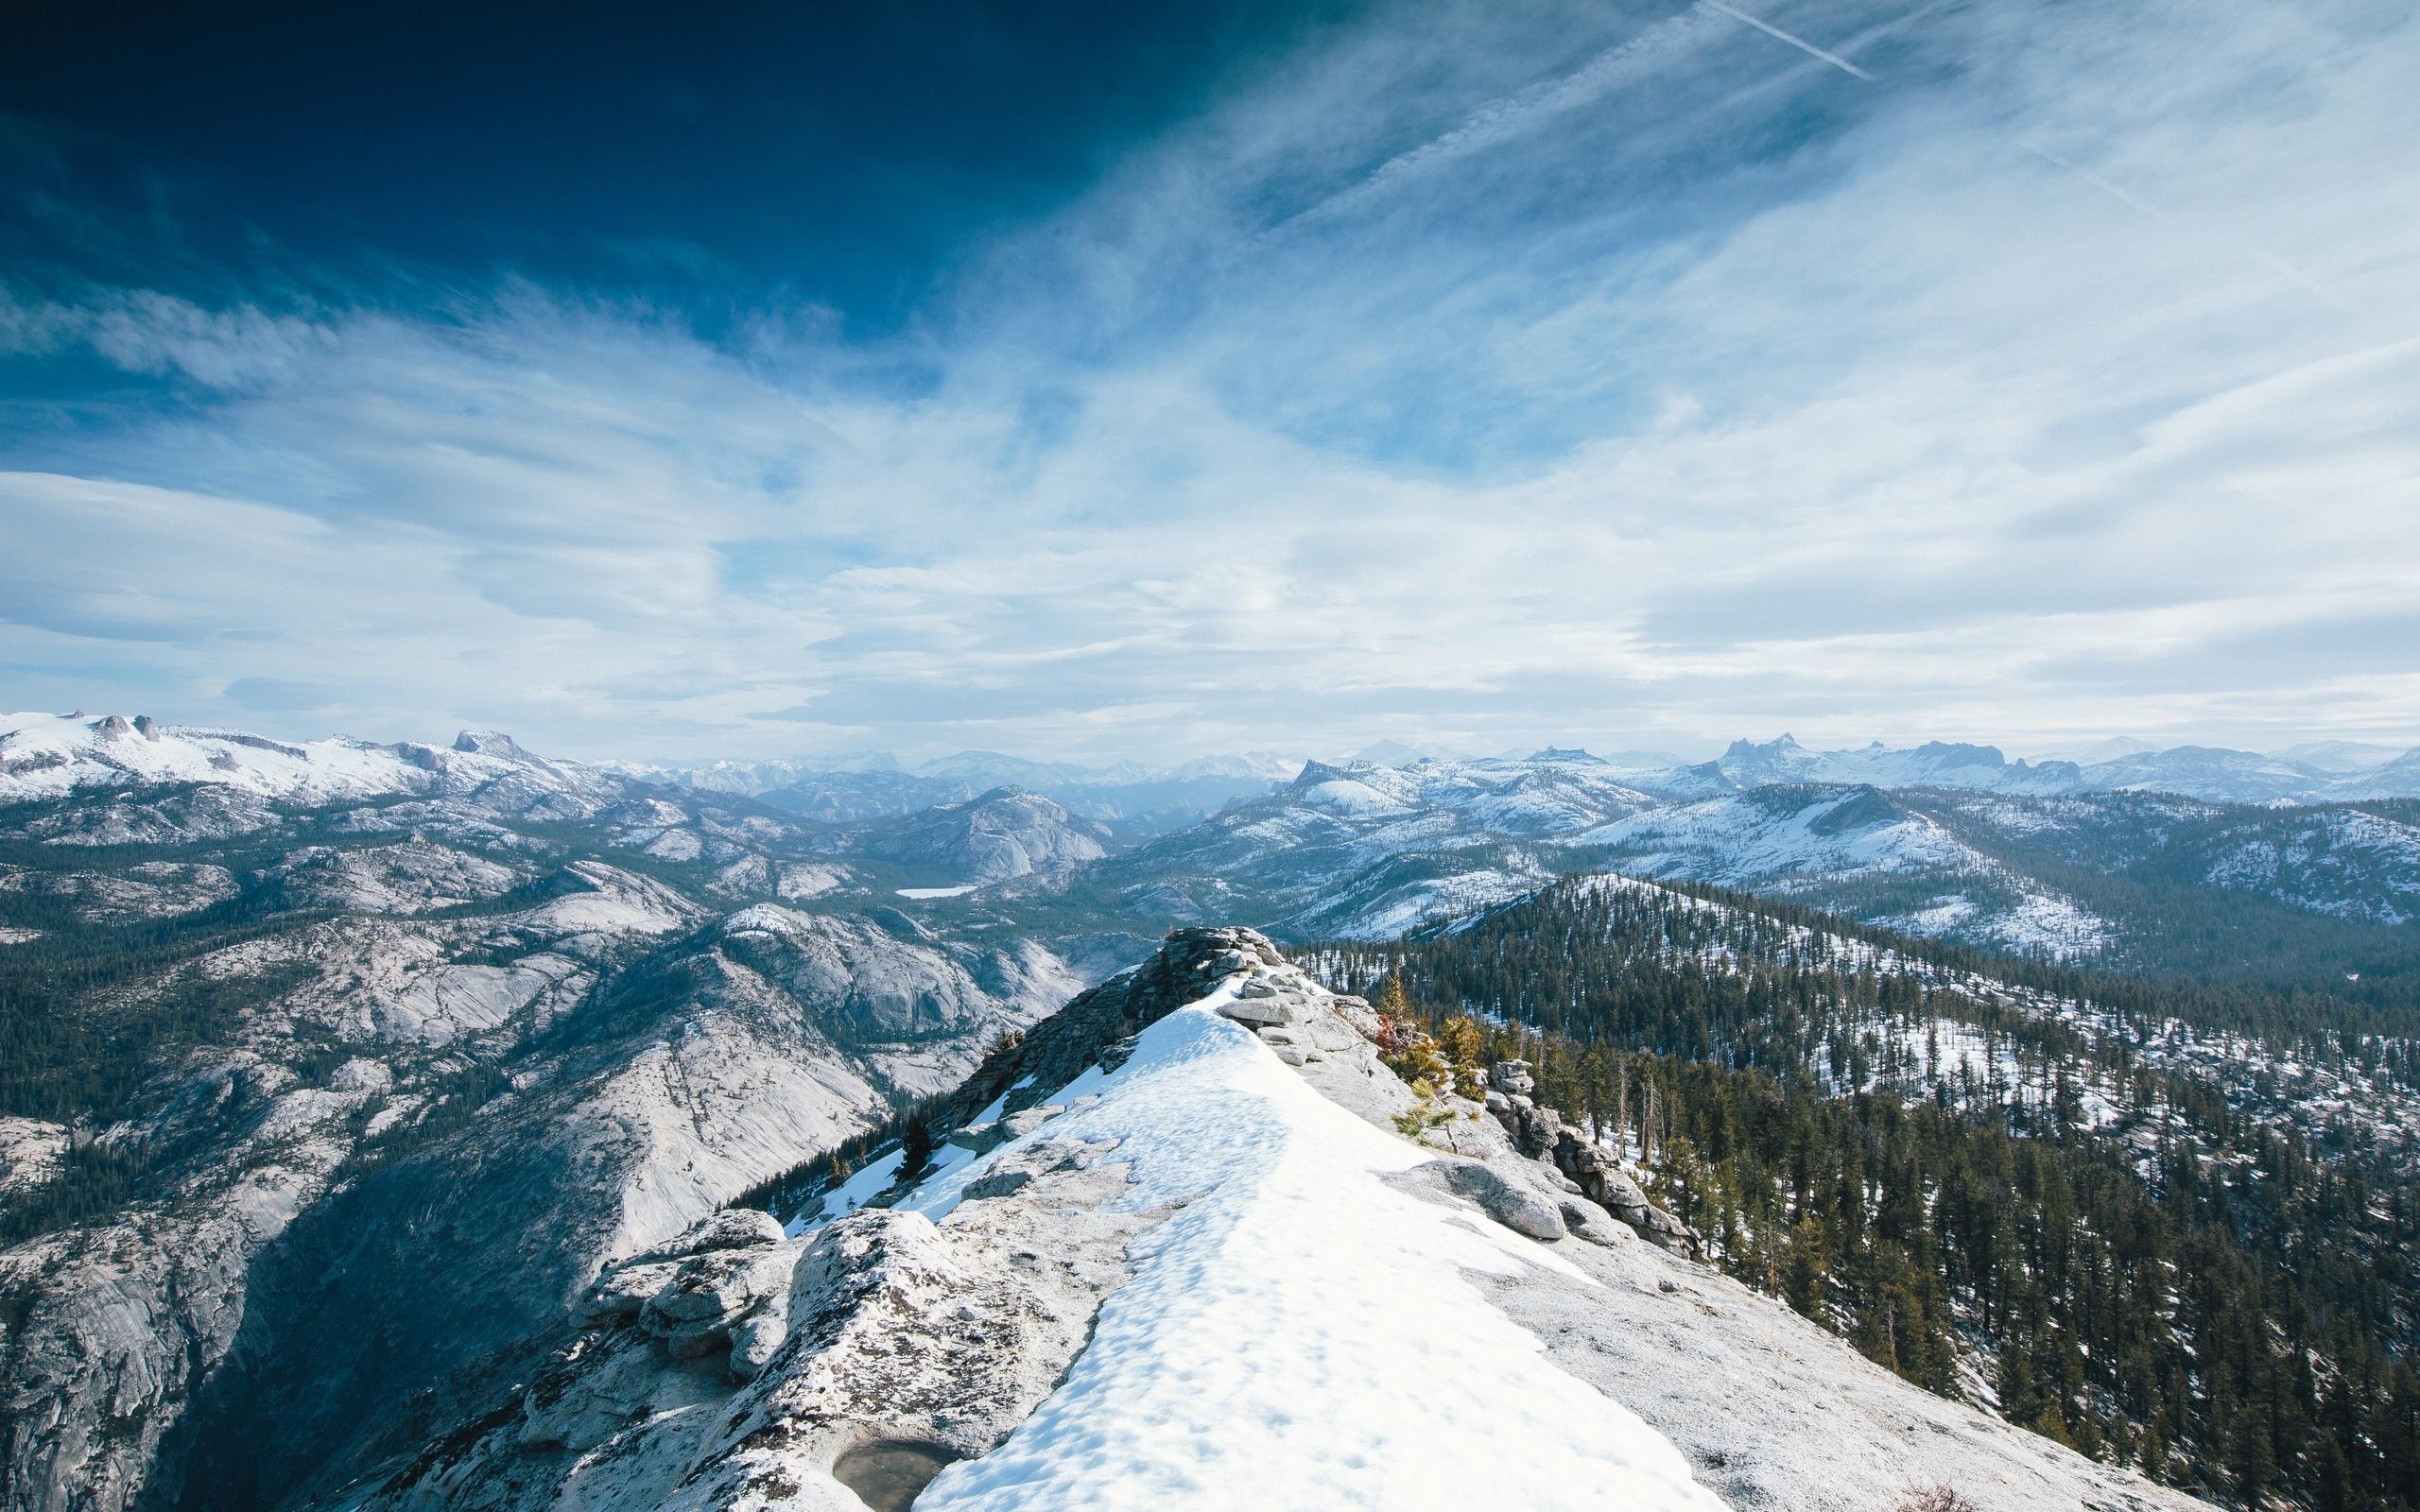 yosemite, 5k, 4k wallpaper, 8k, winter, snow, forest, osx, apple, mountains, nature